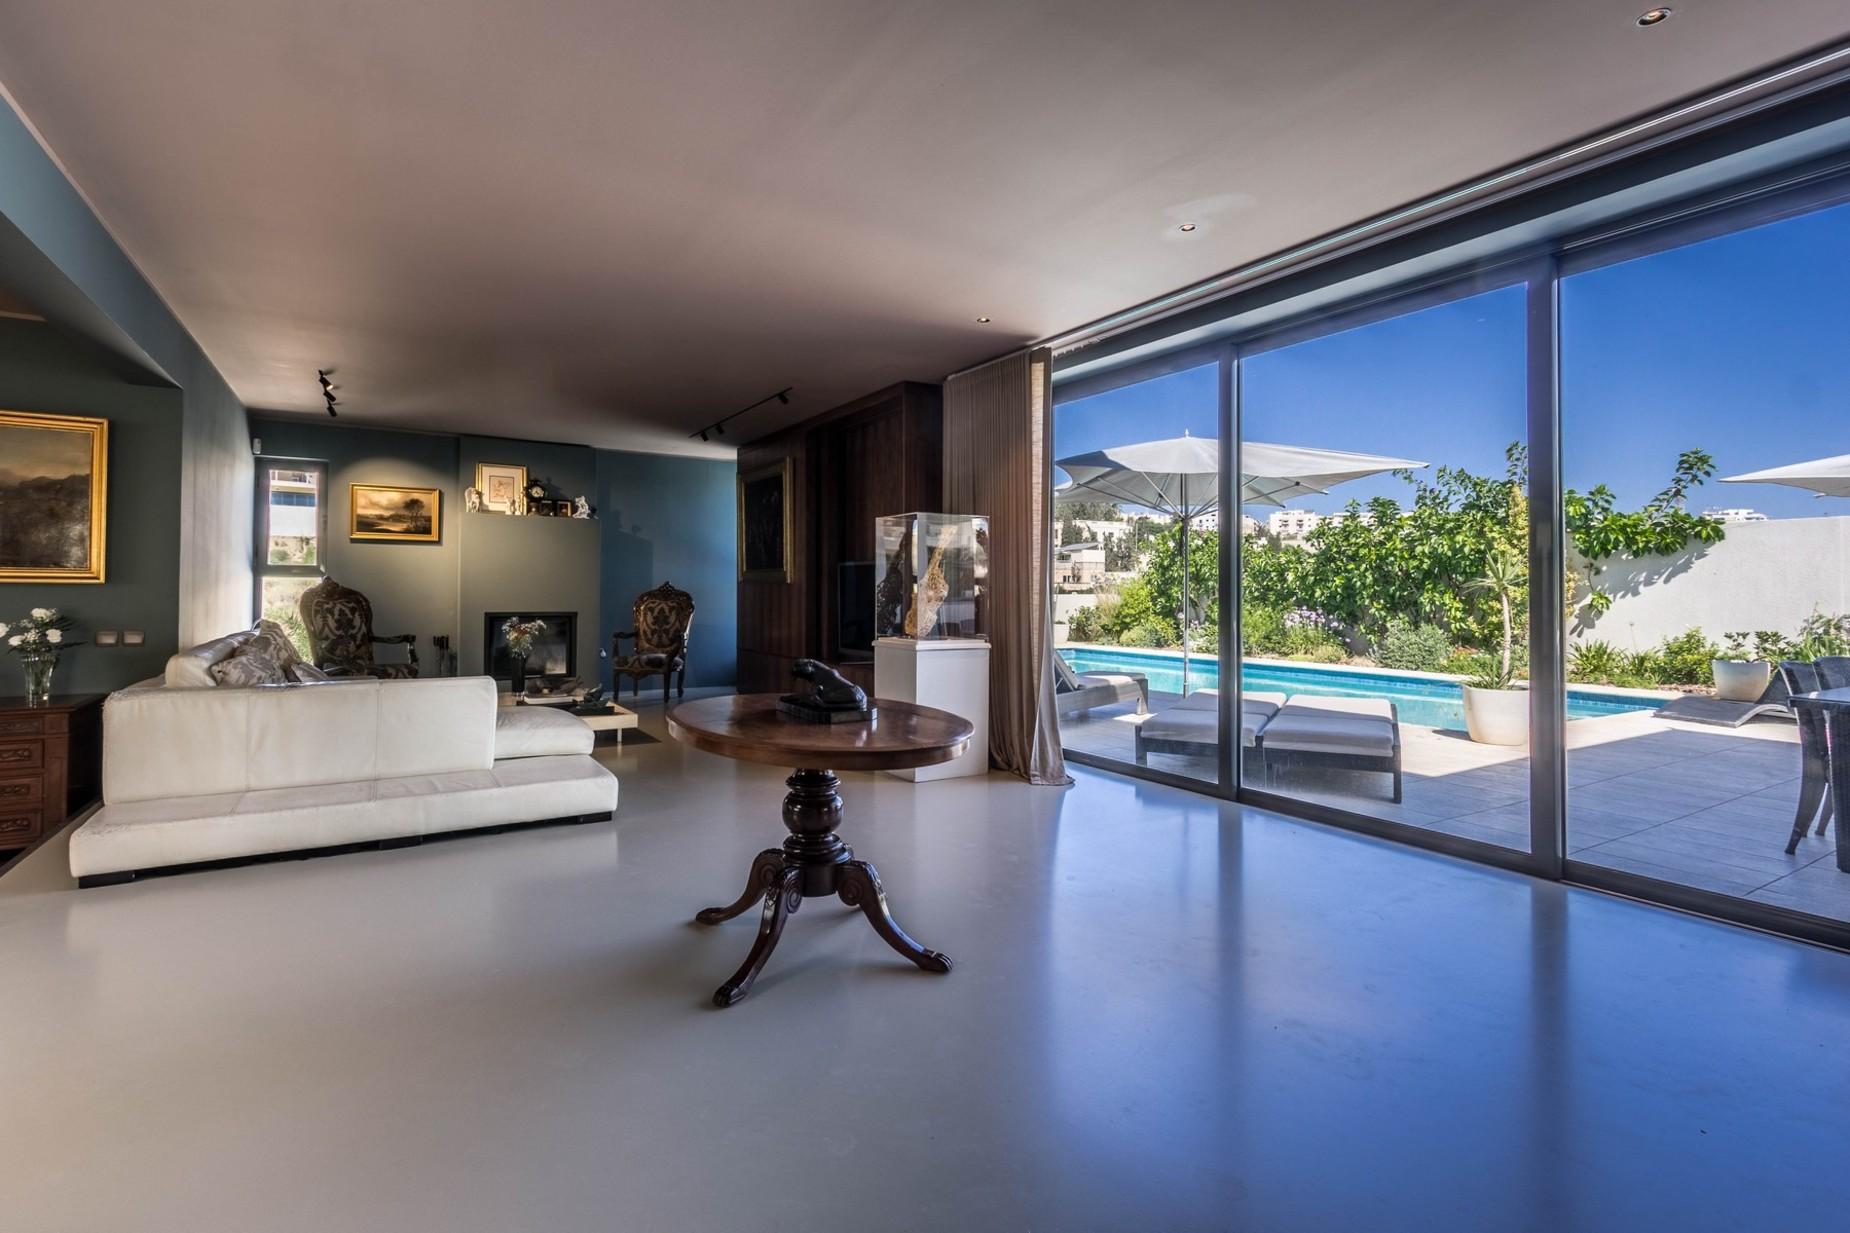 4 bed Villa For Rent in Iklin, Iklin - thumb 4